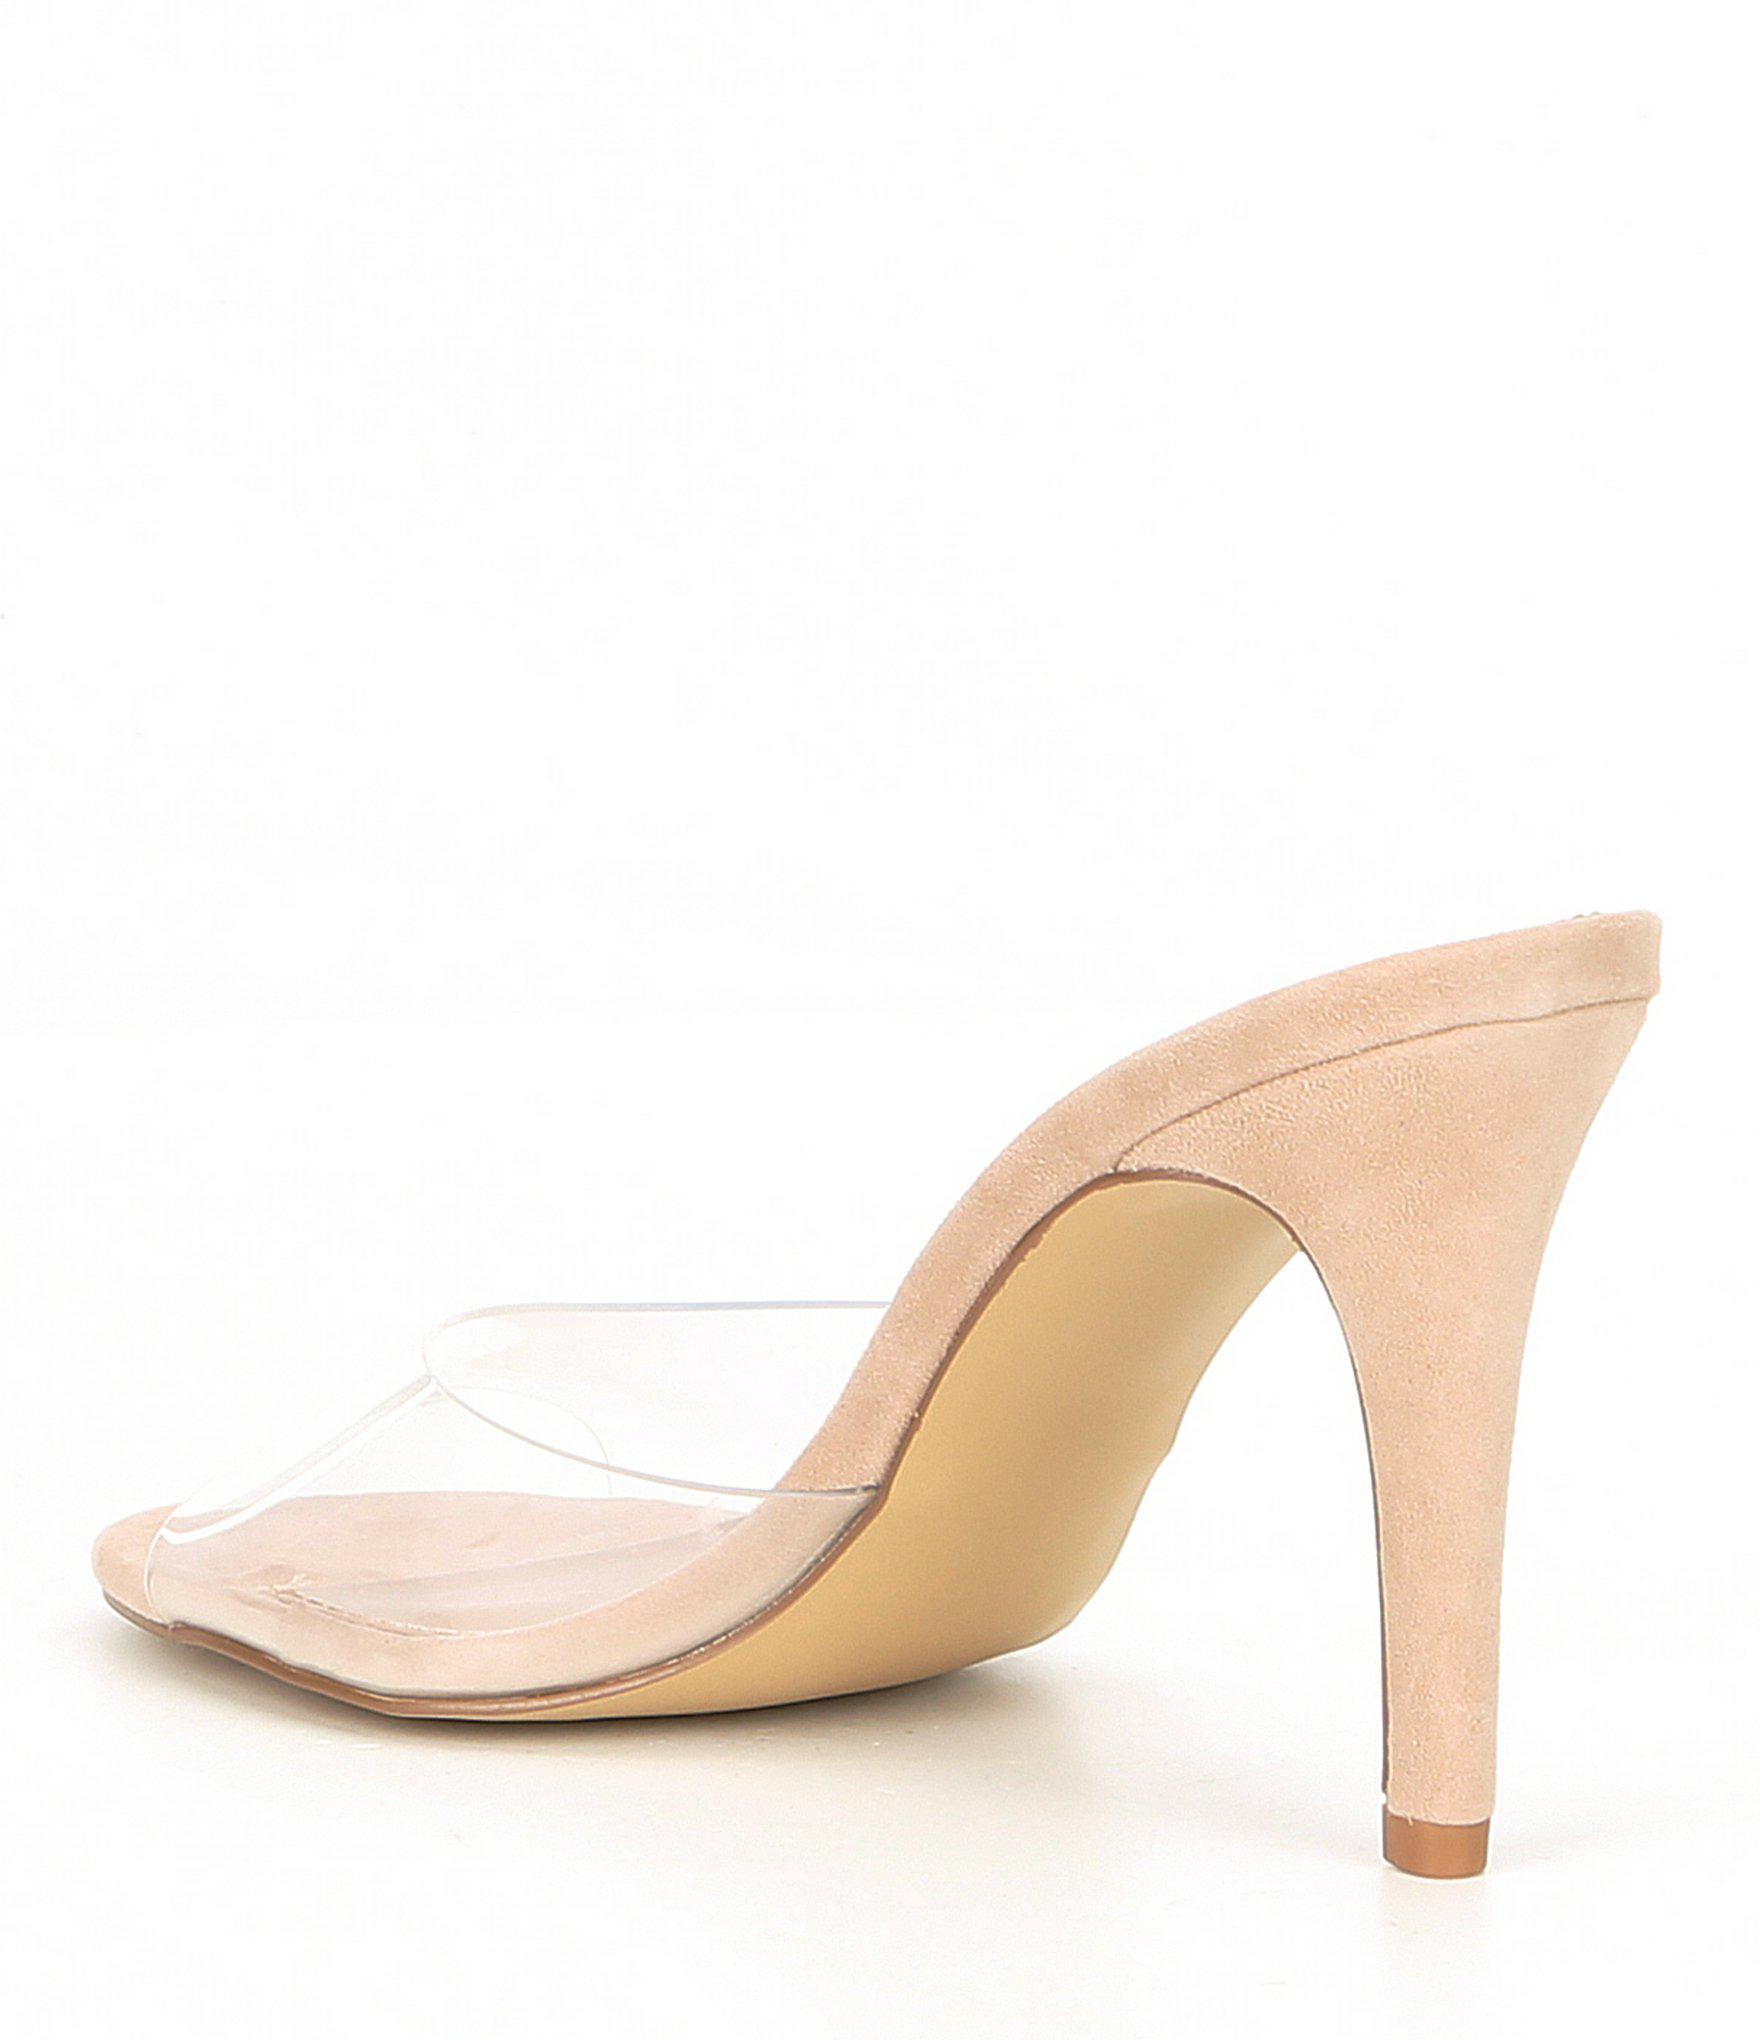 75a7f861bb2 Steve Madden - Multicolor Erin Clear Stiletto Sandals - Lyst. View  fullscreen